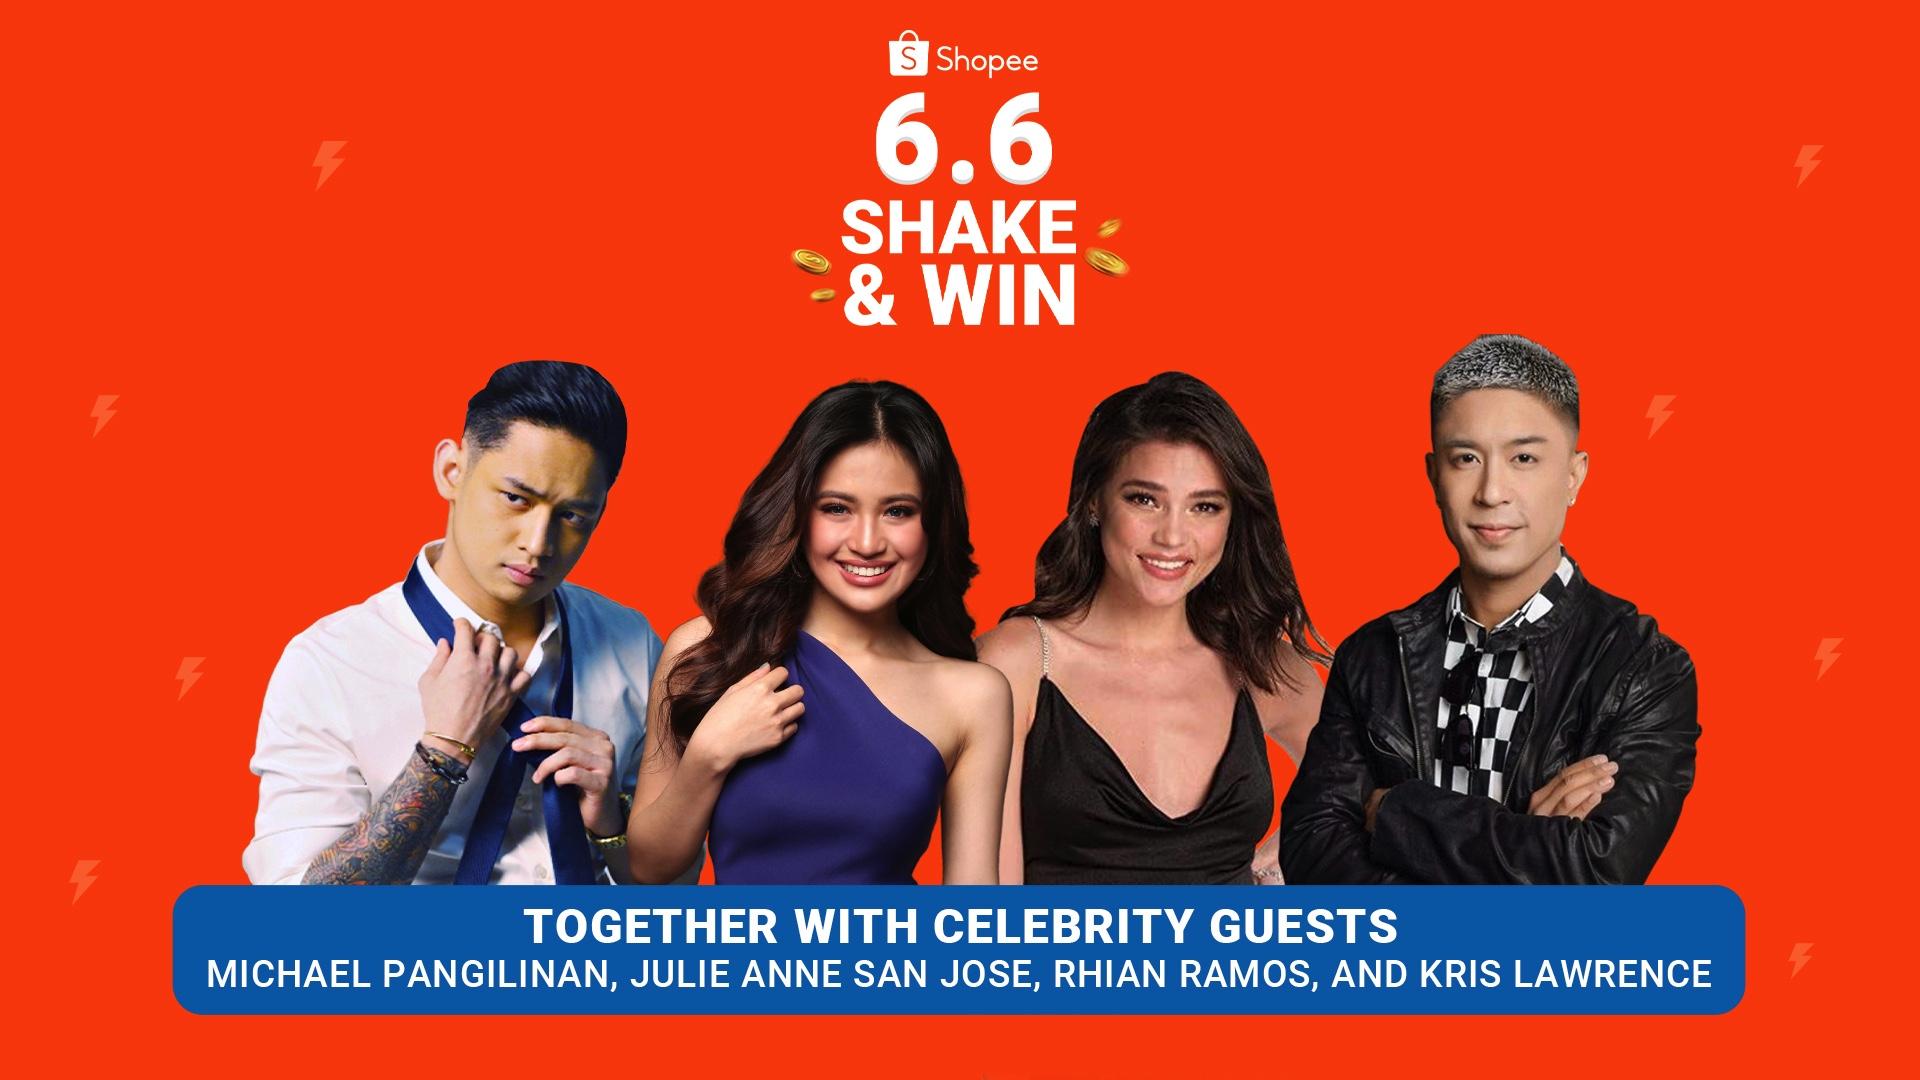 Shopee 6.6 Shake & Win